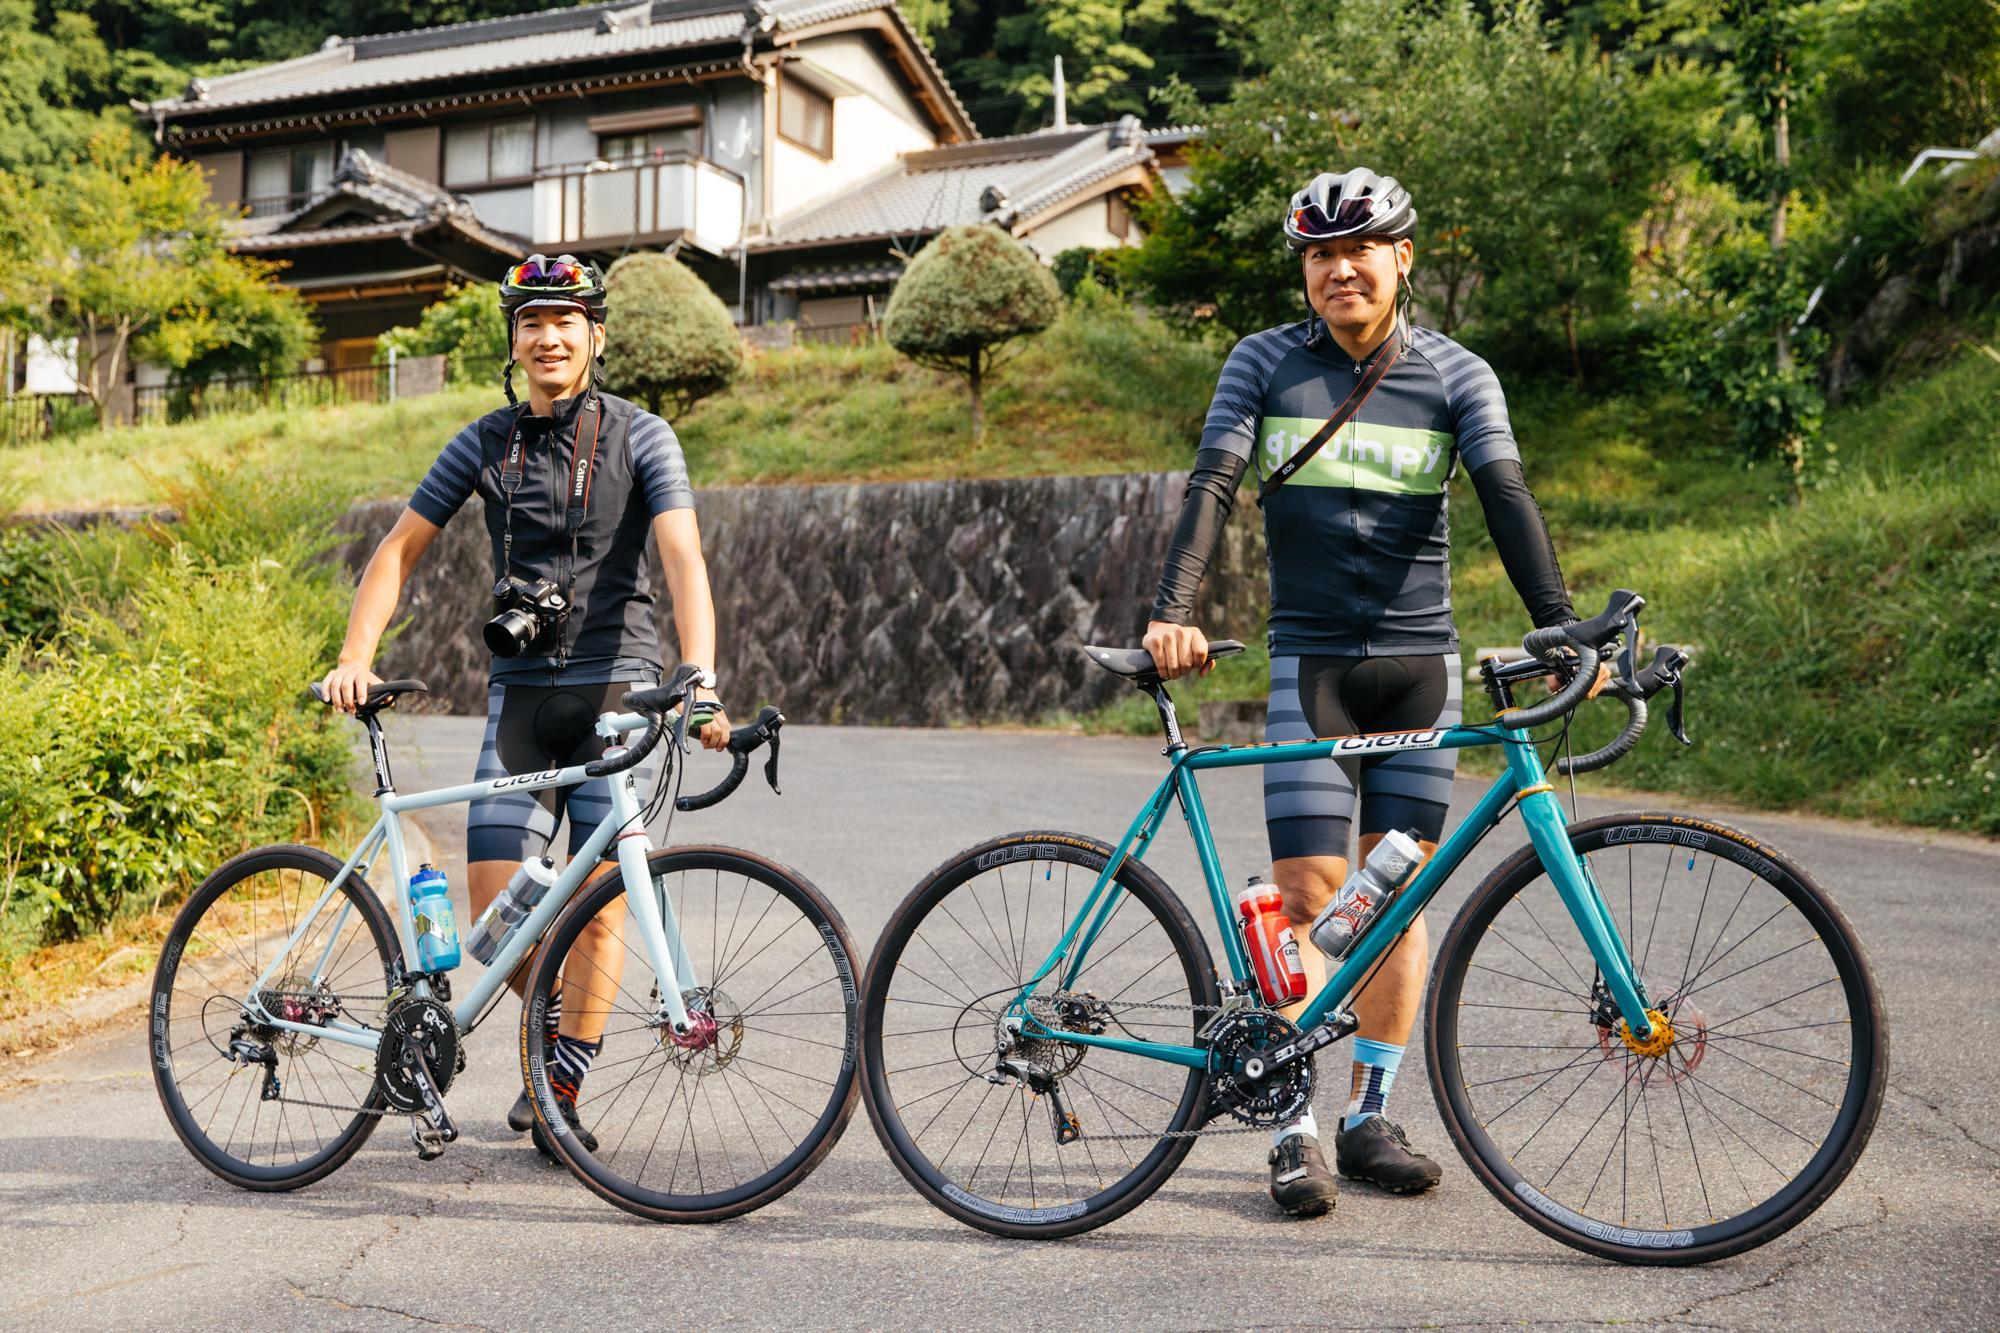 Riders!